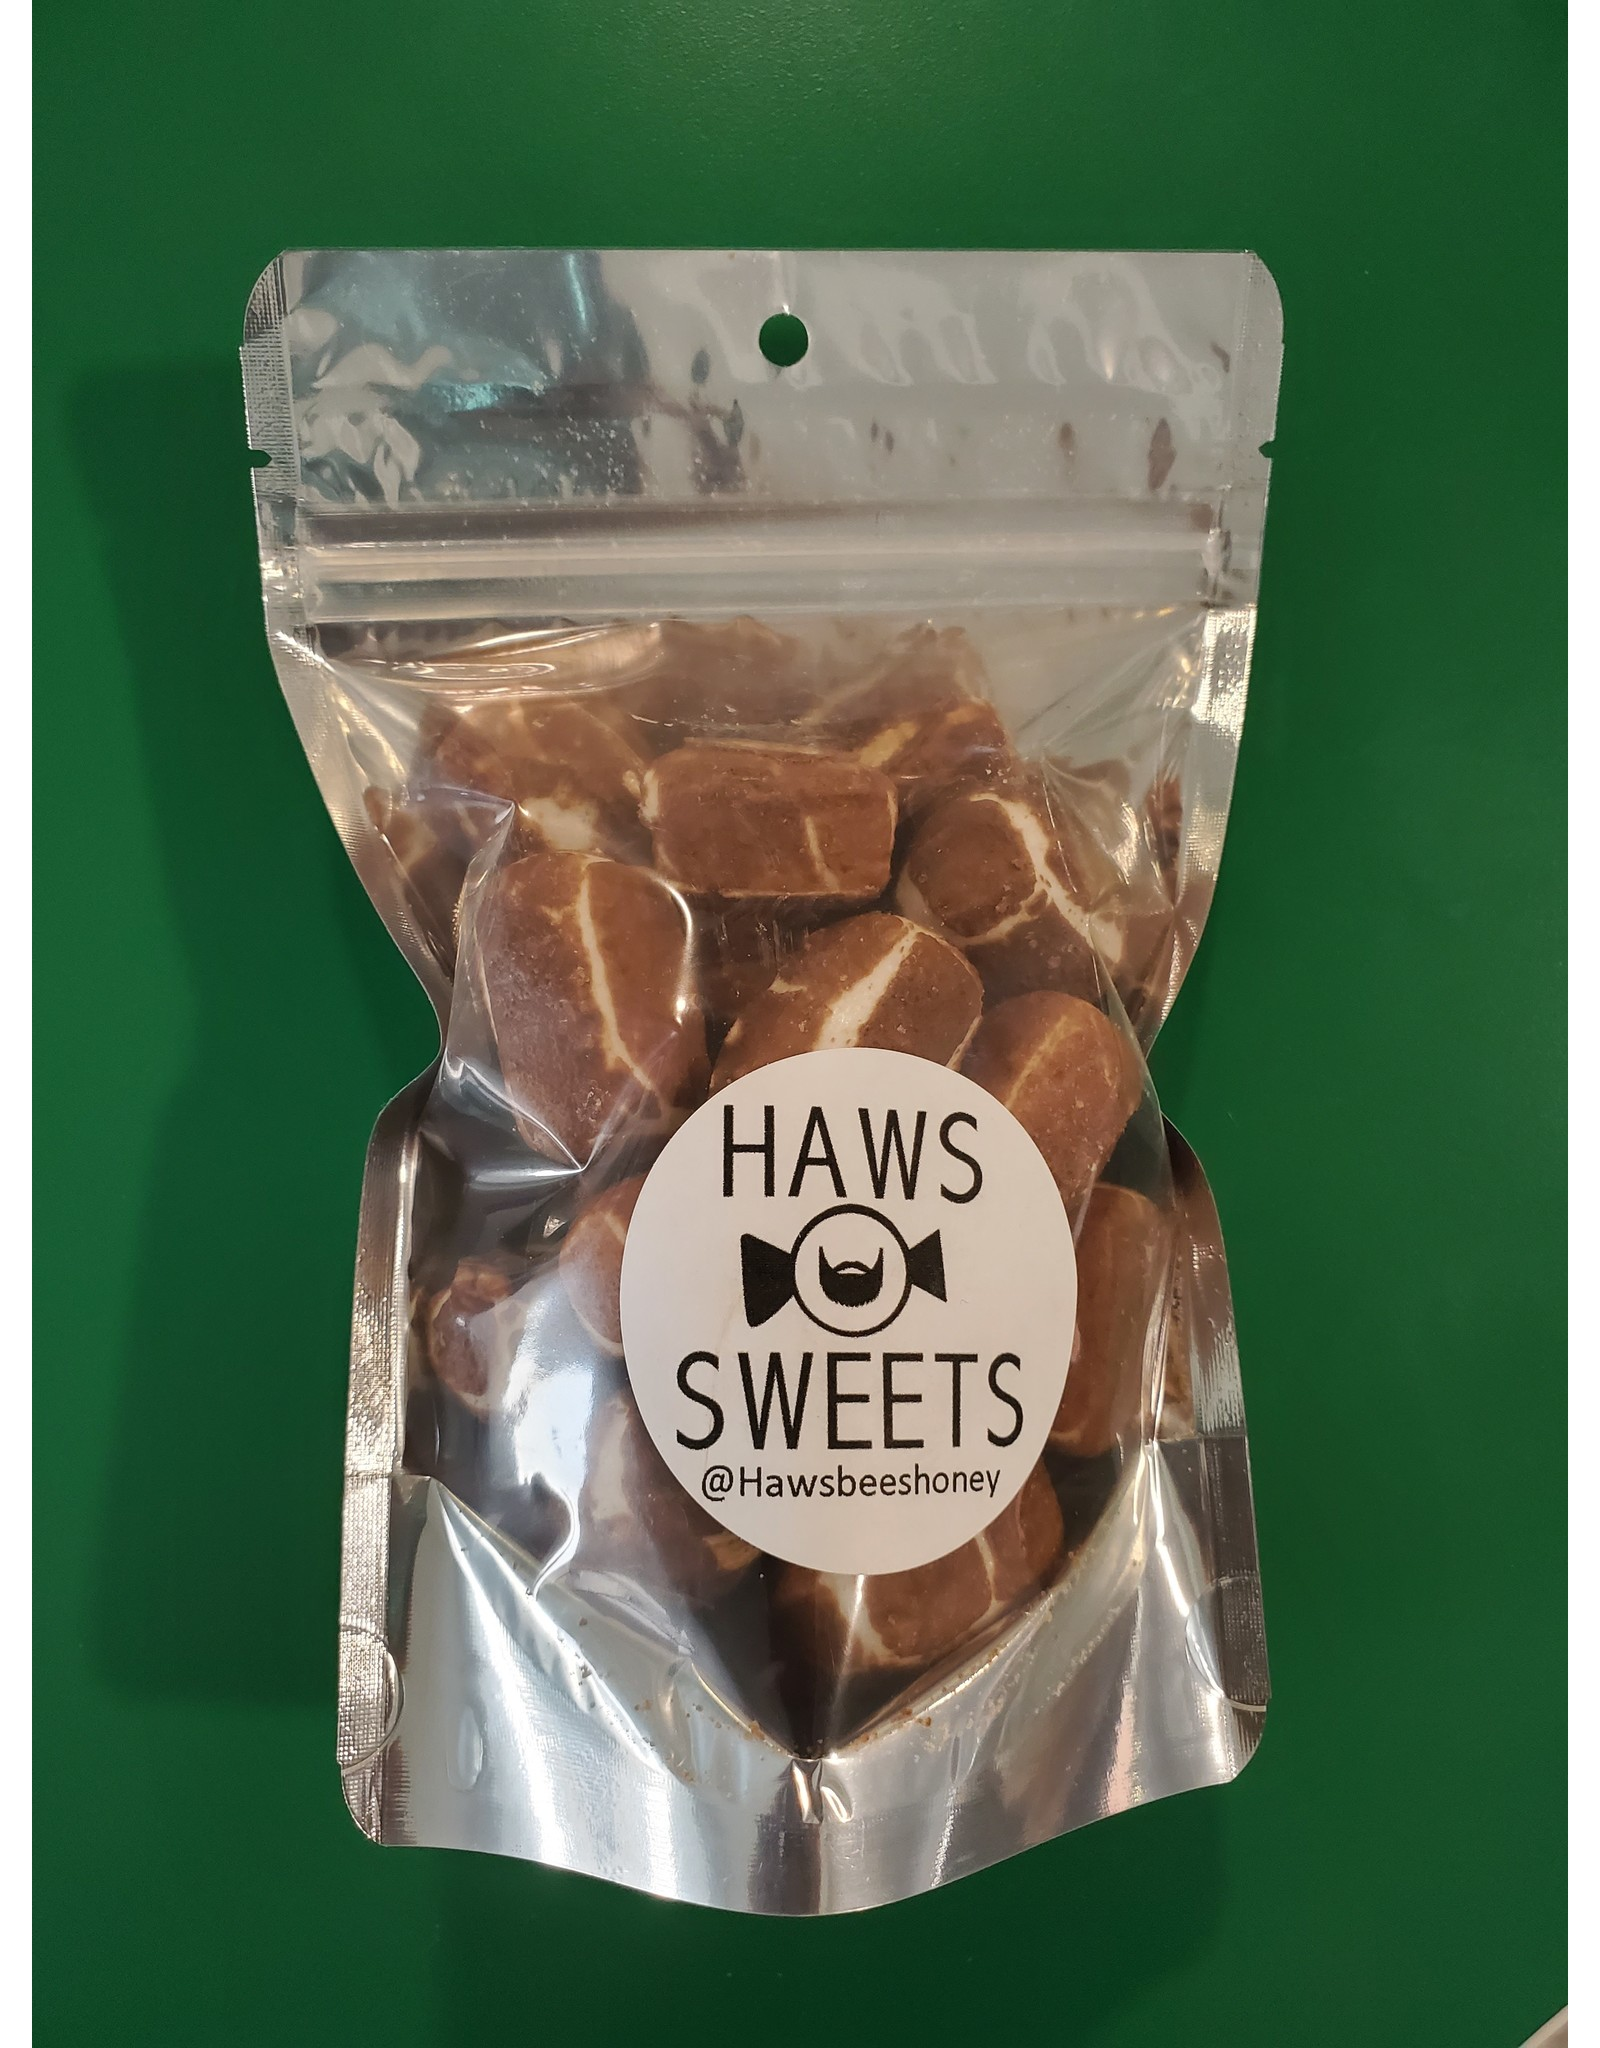 Haws Sweets Haws Sweets